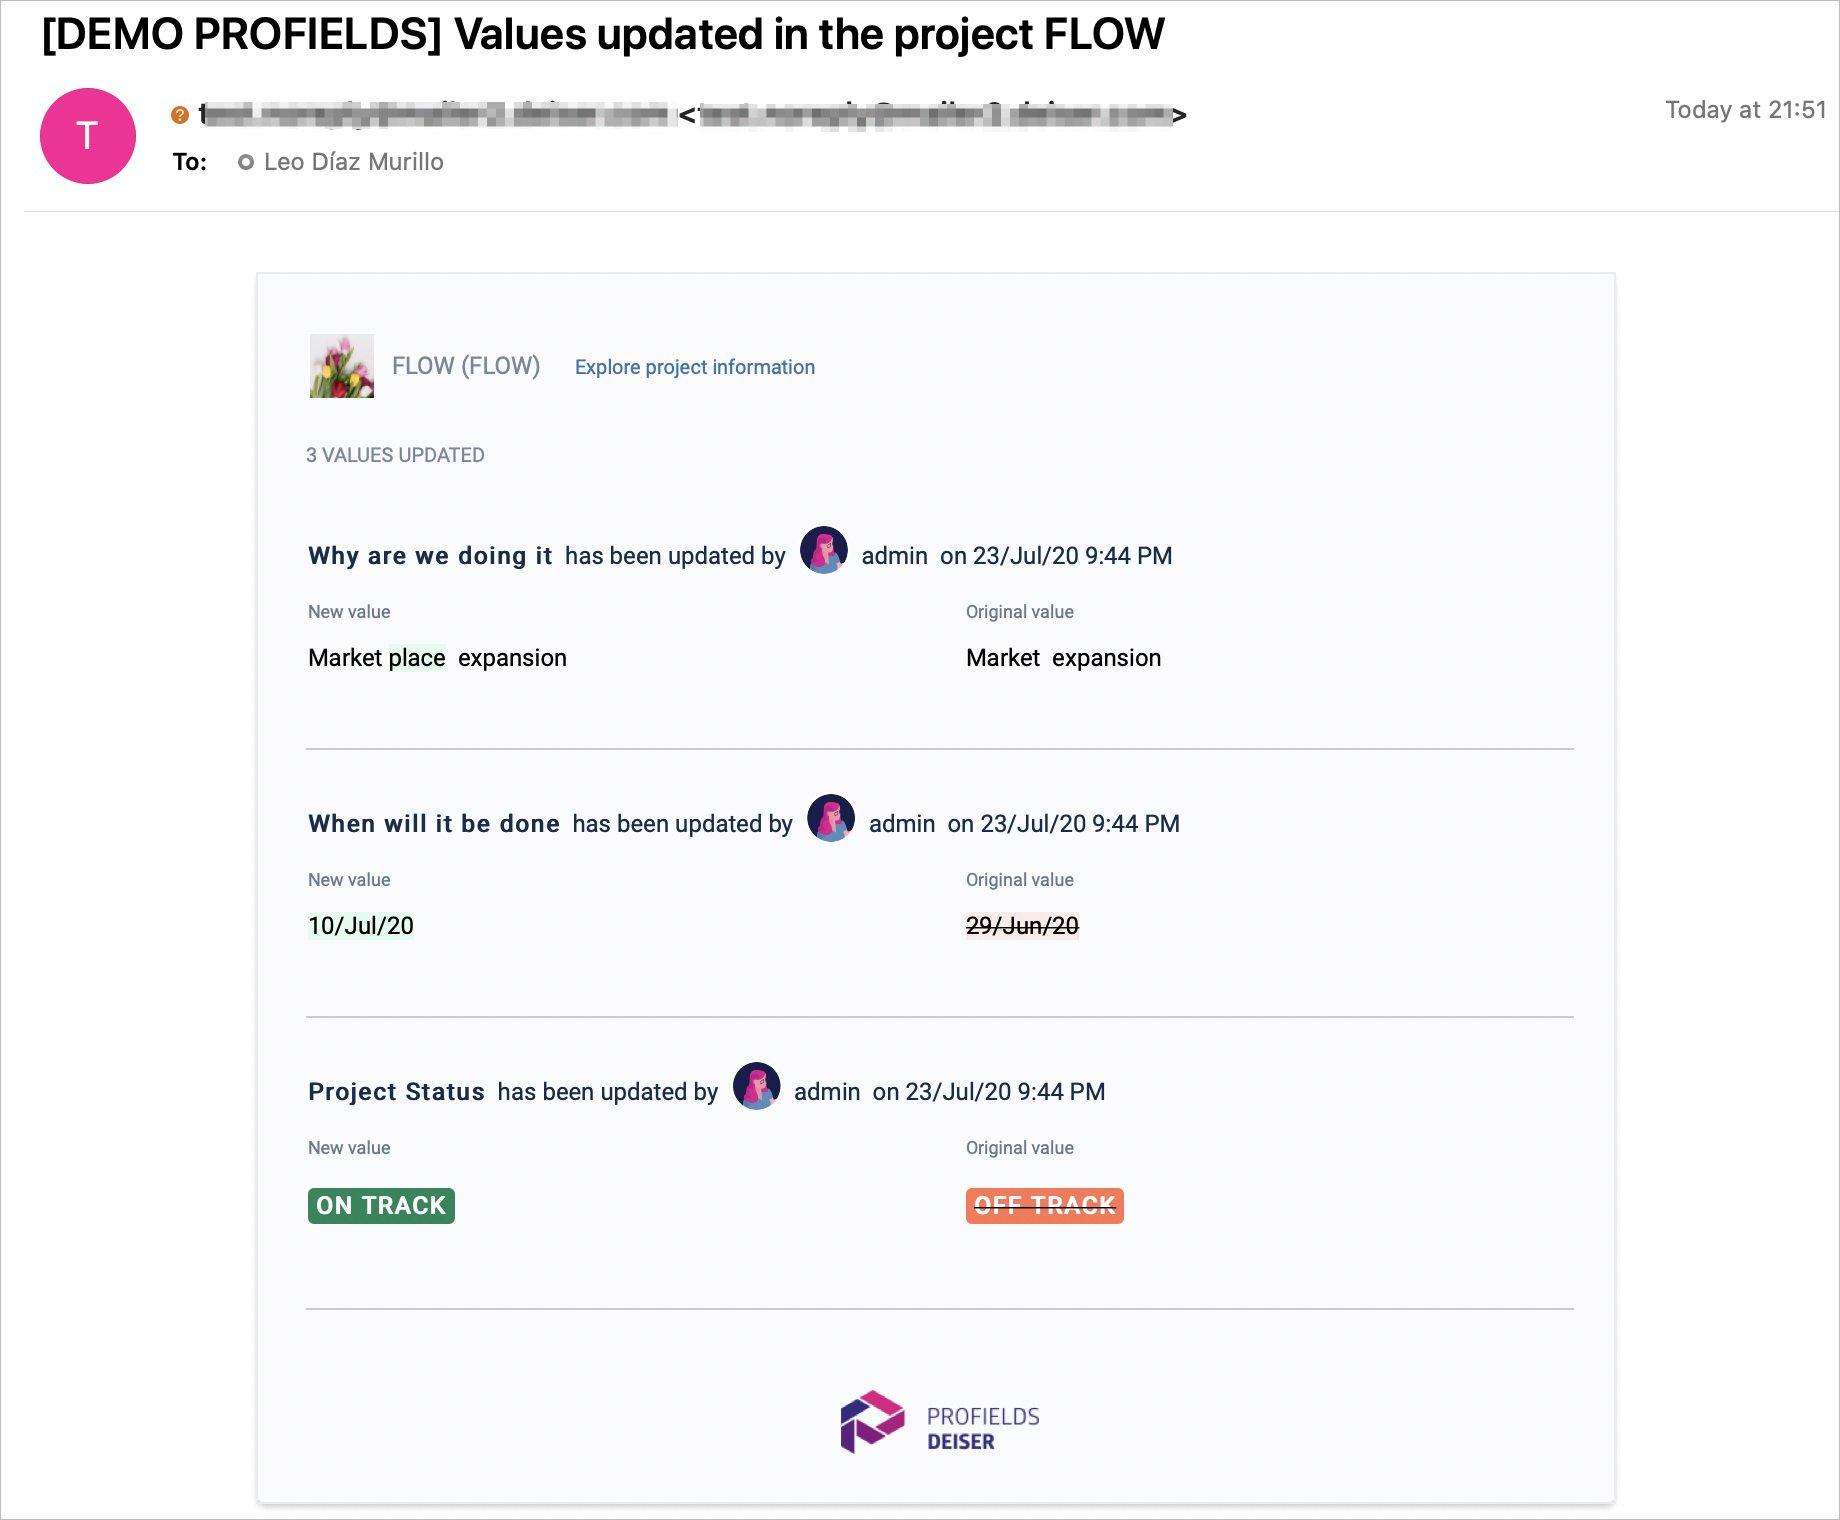 alertas-correo-electronico-de-proyectos-jira-profields_trz_2